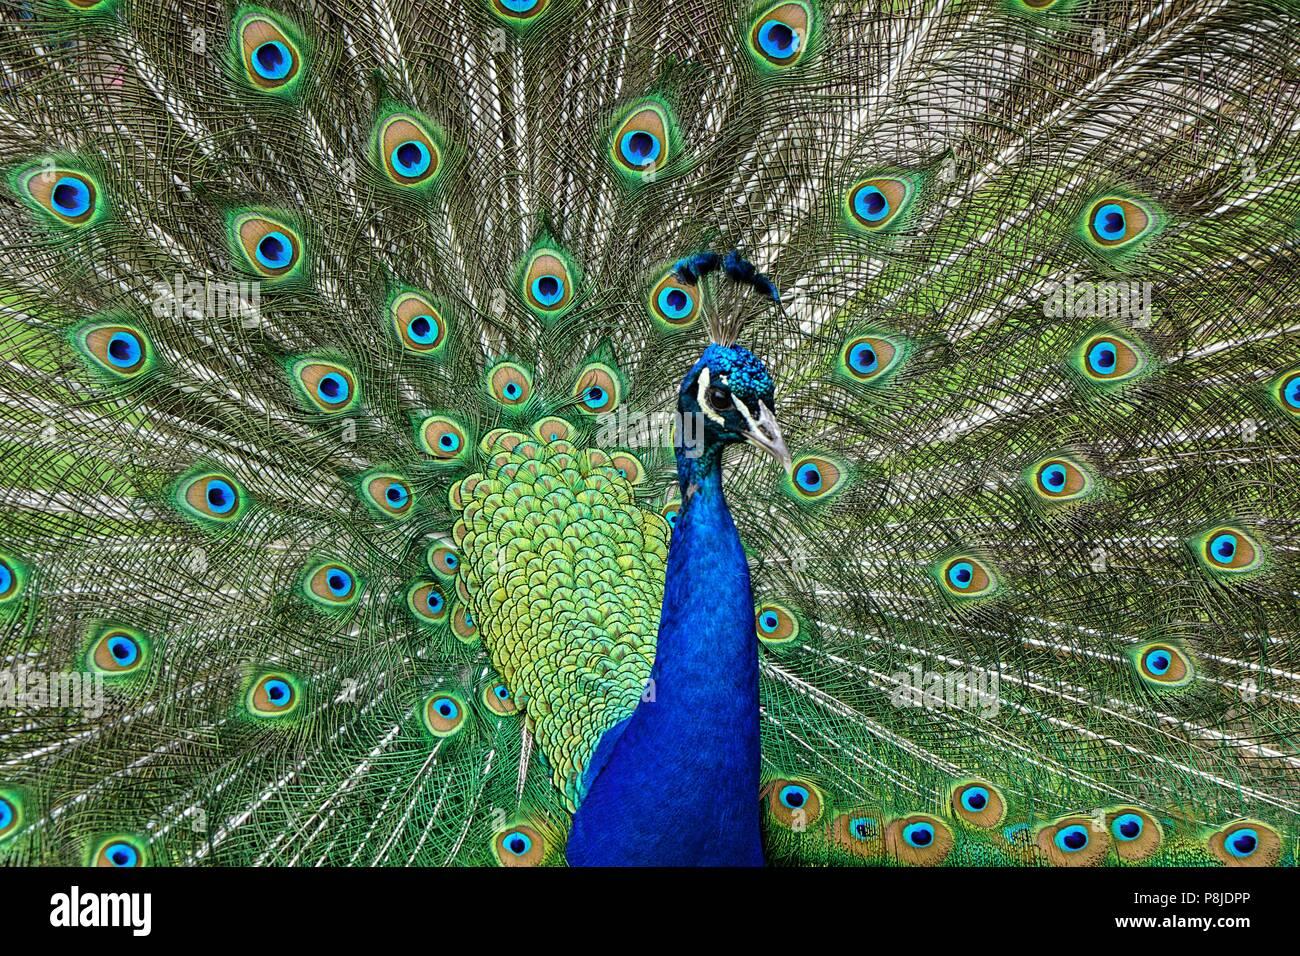 Peacock at Kew Gardens - Stock Image